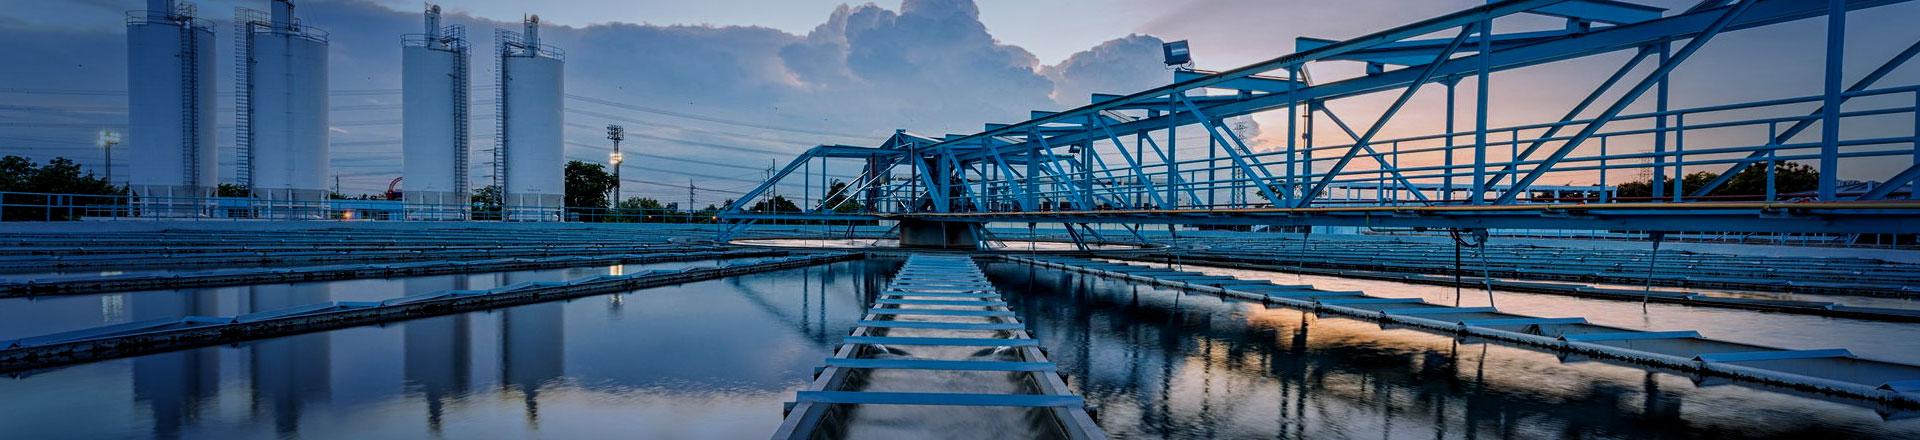 Phoenix Water Technologies Ltd